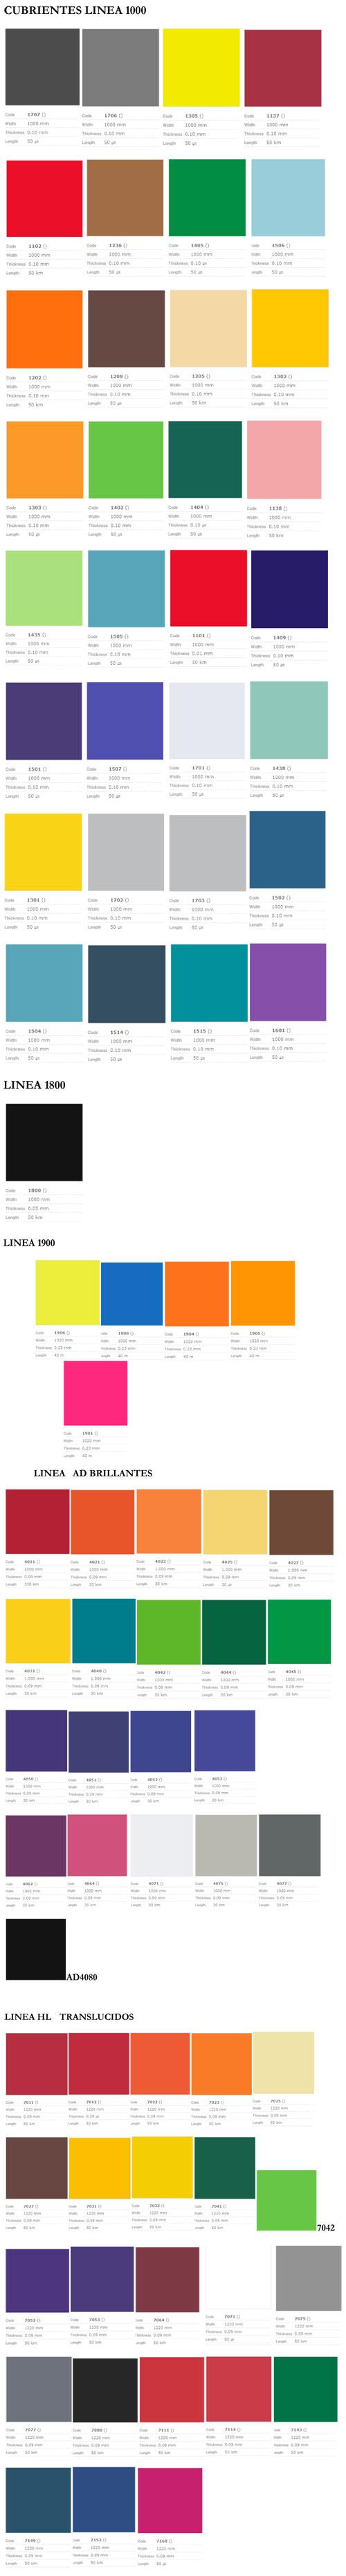 148837-Gama-Colores-1